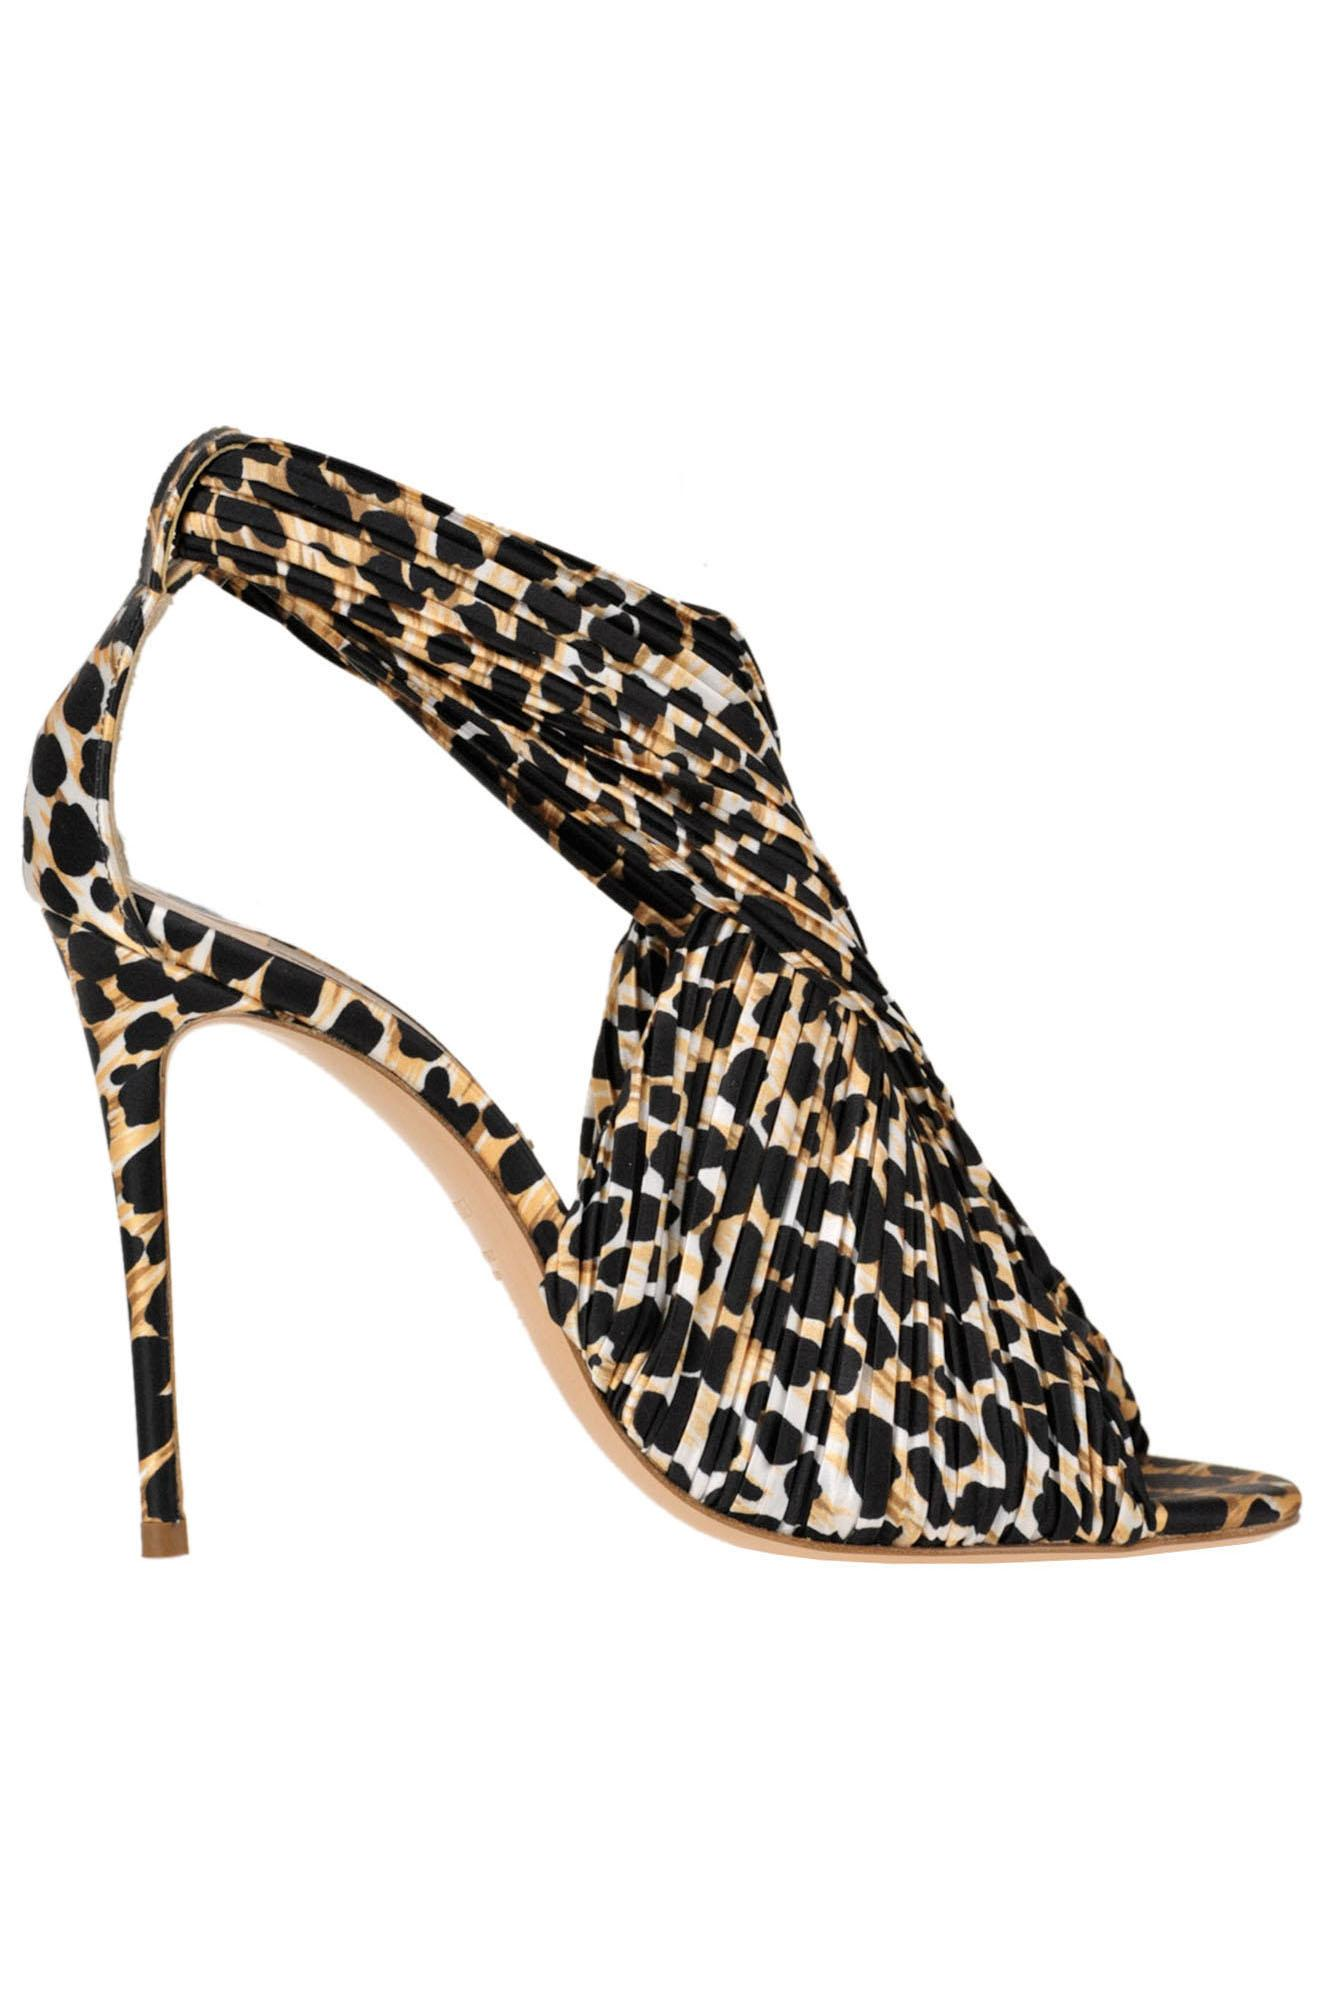 6eaaf25001 Casadei Animal Print Satin Sandals in Natural - Lyst